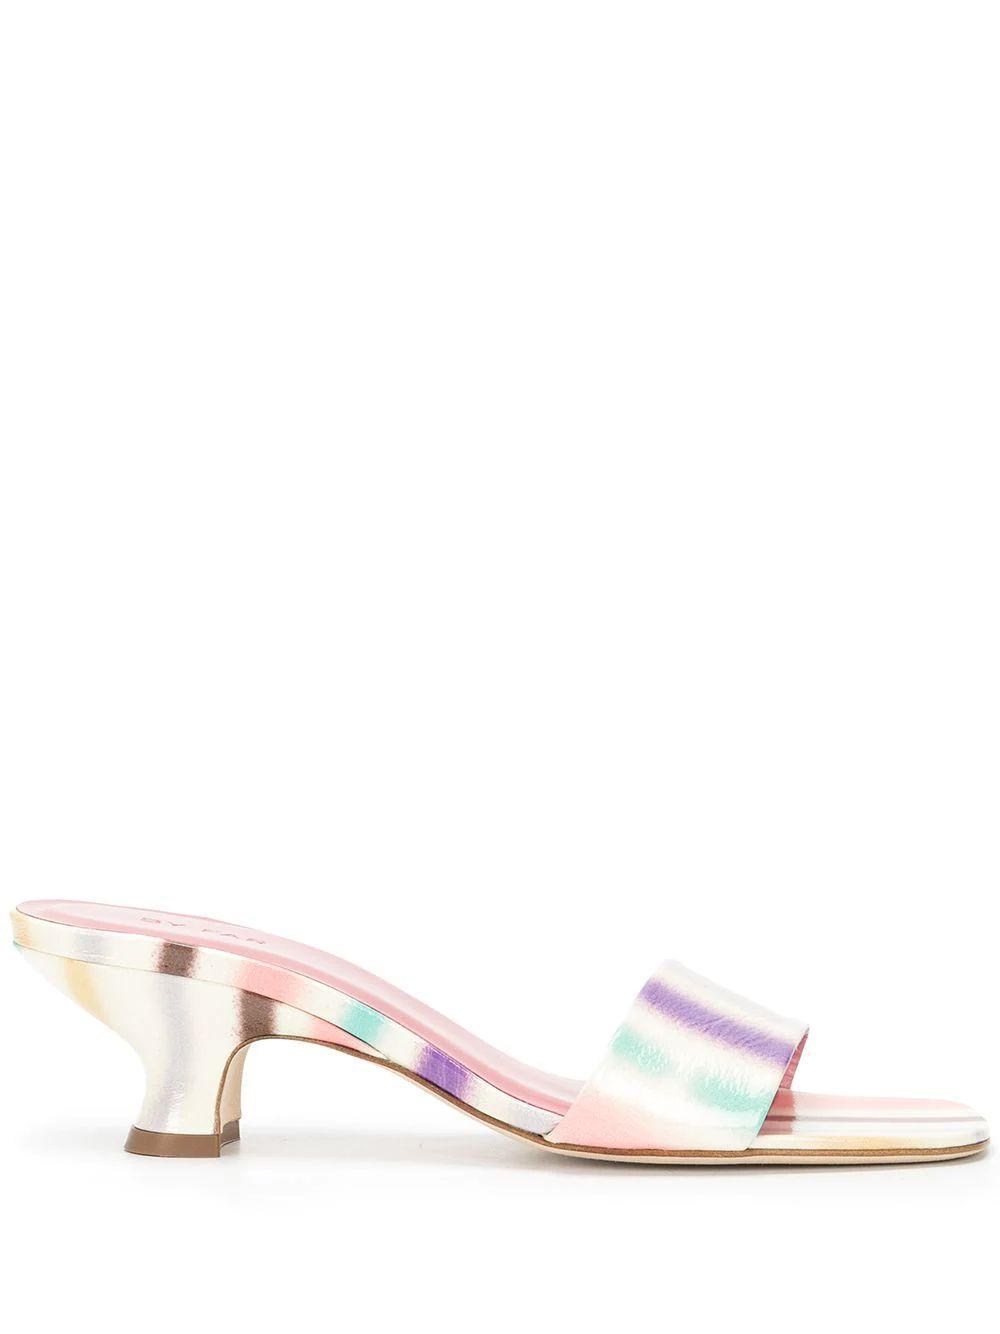 Freddy Striped Slide Sandals Item # 21SSFRMIVRSPR